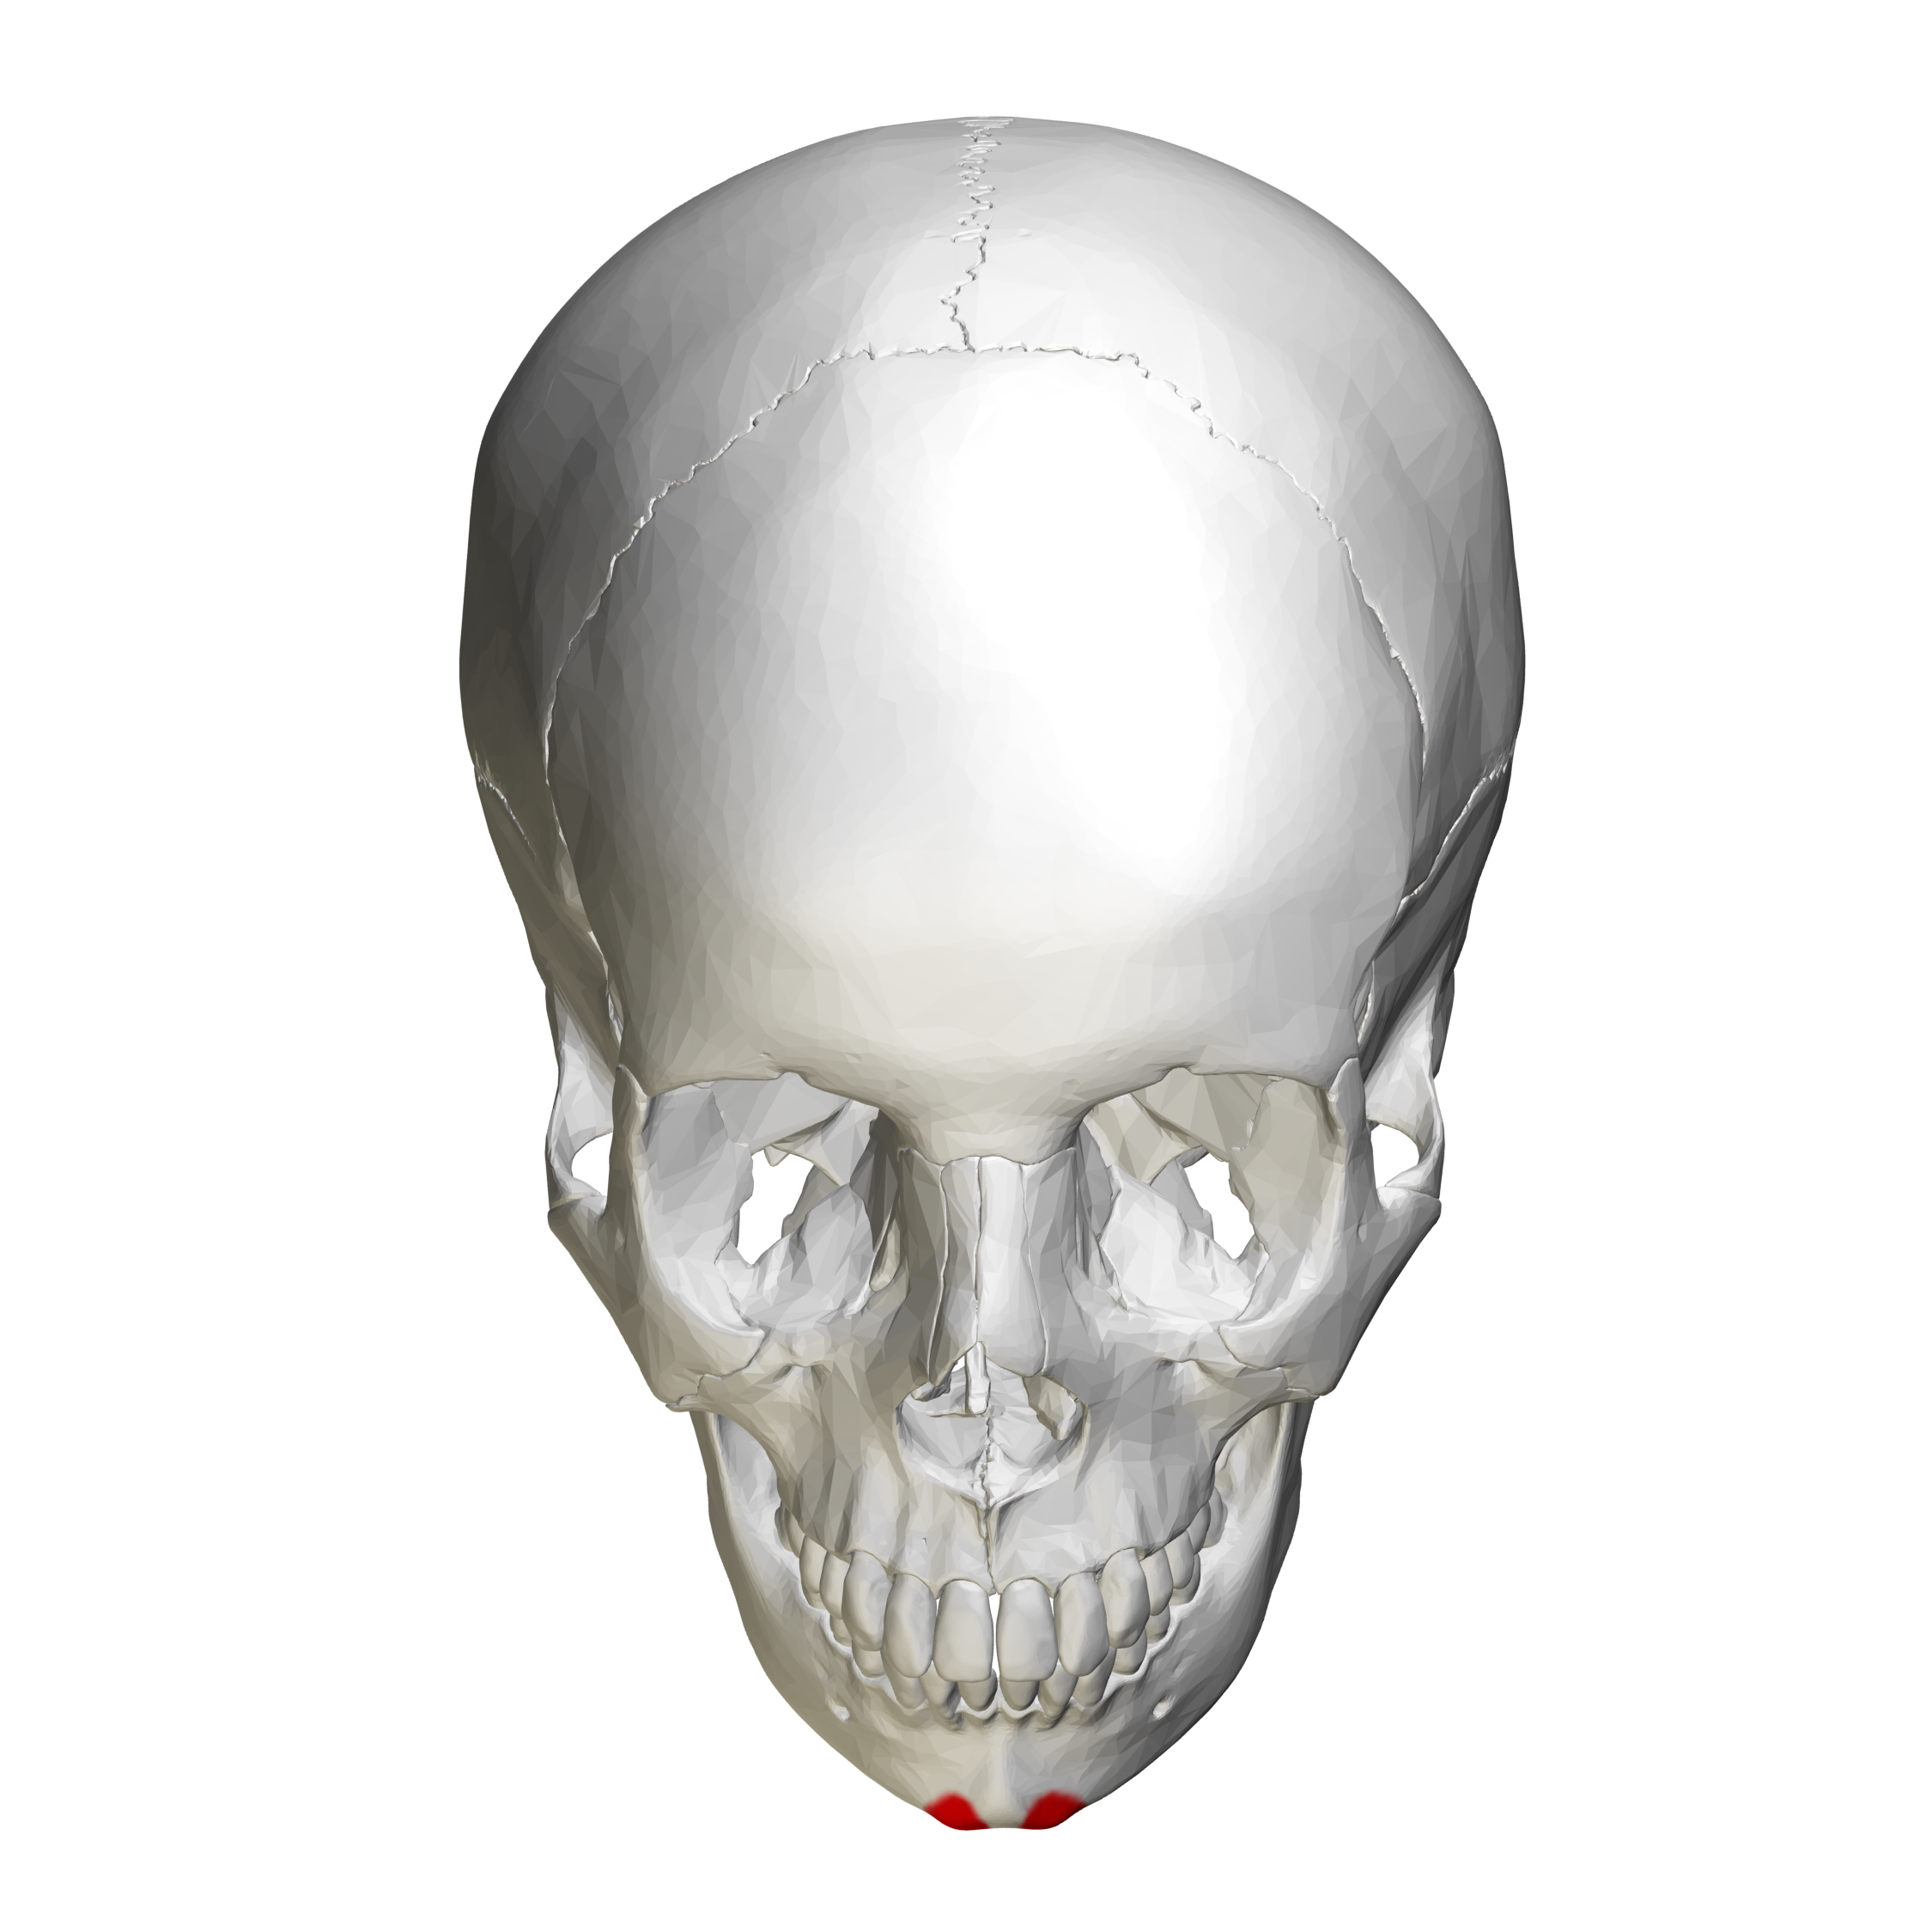 File:Mental tubercle - skull - anterior view02.png ...